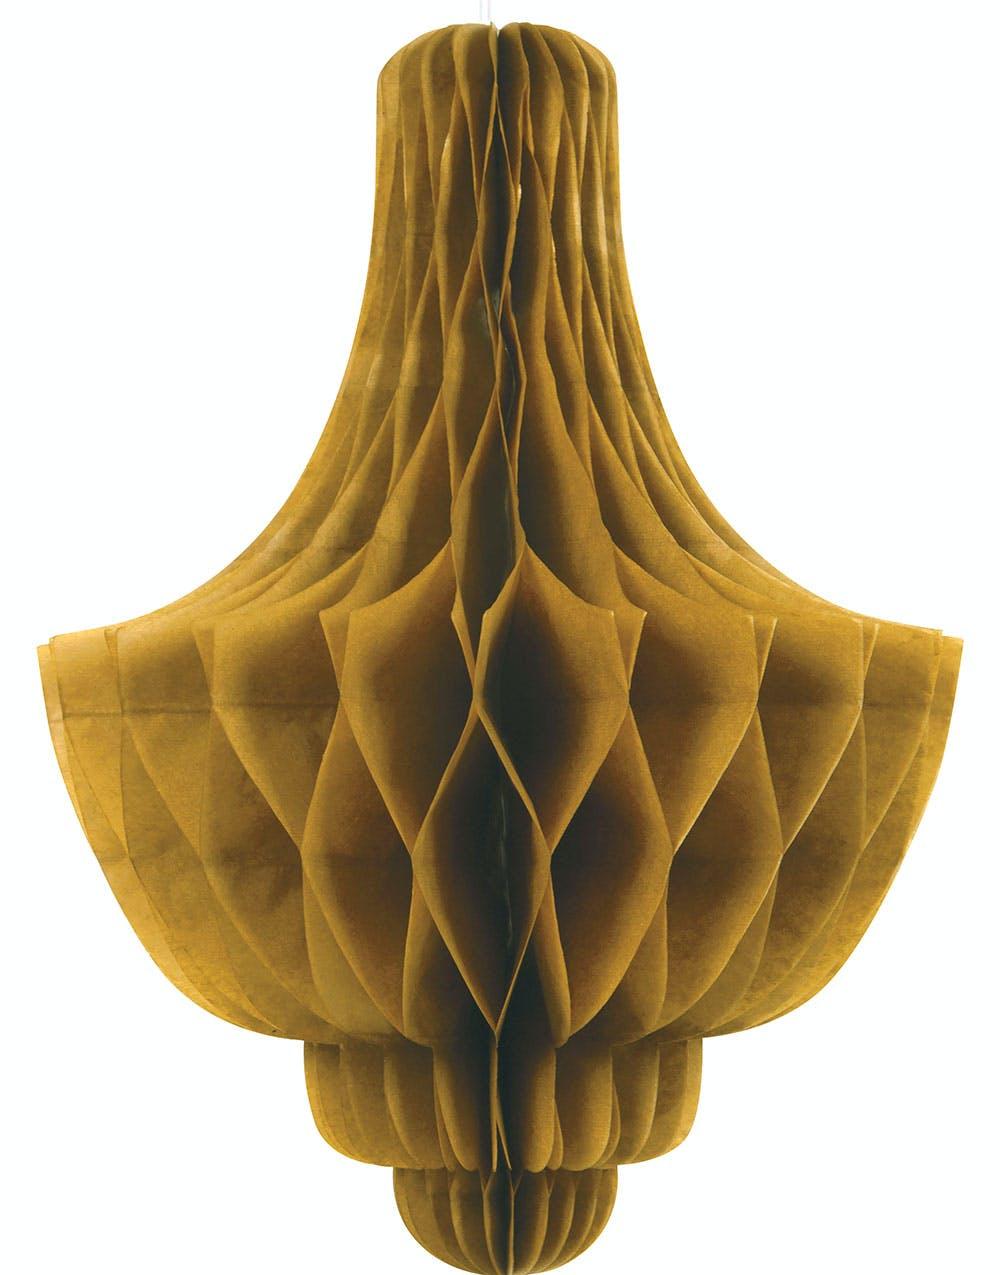 1 st Guldfärgad Lampkroneformad Honeycomb 35 cm 2511dc27e6012